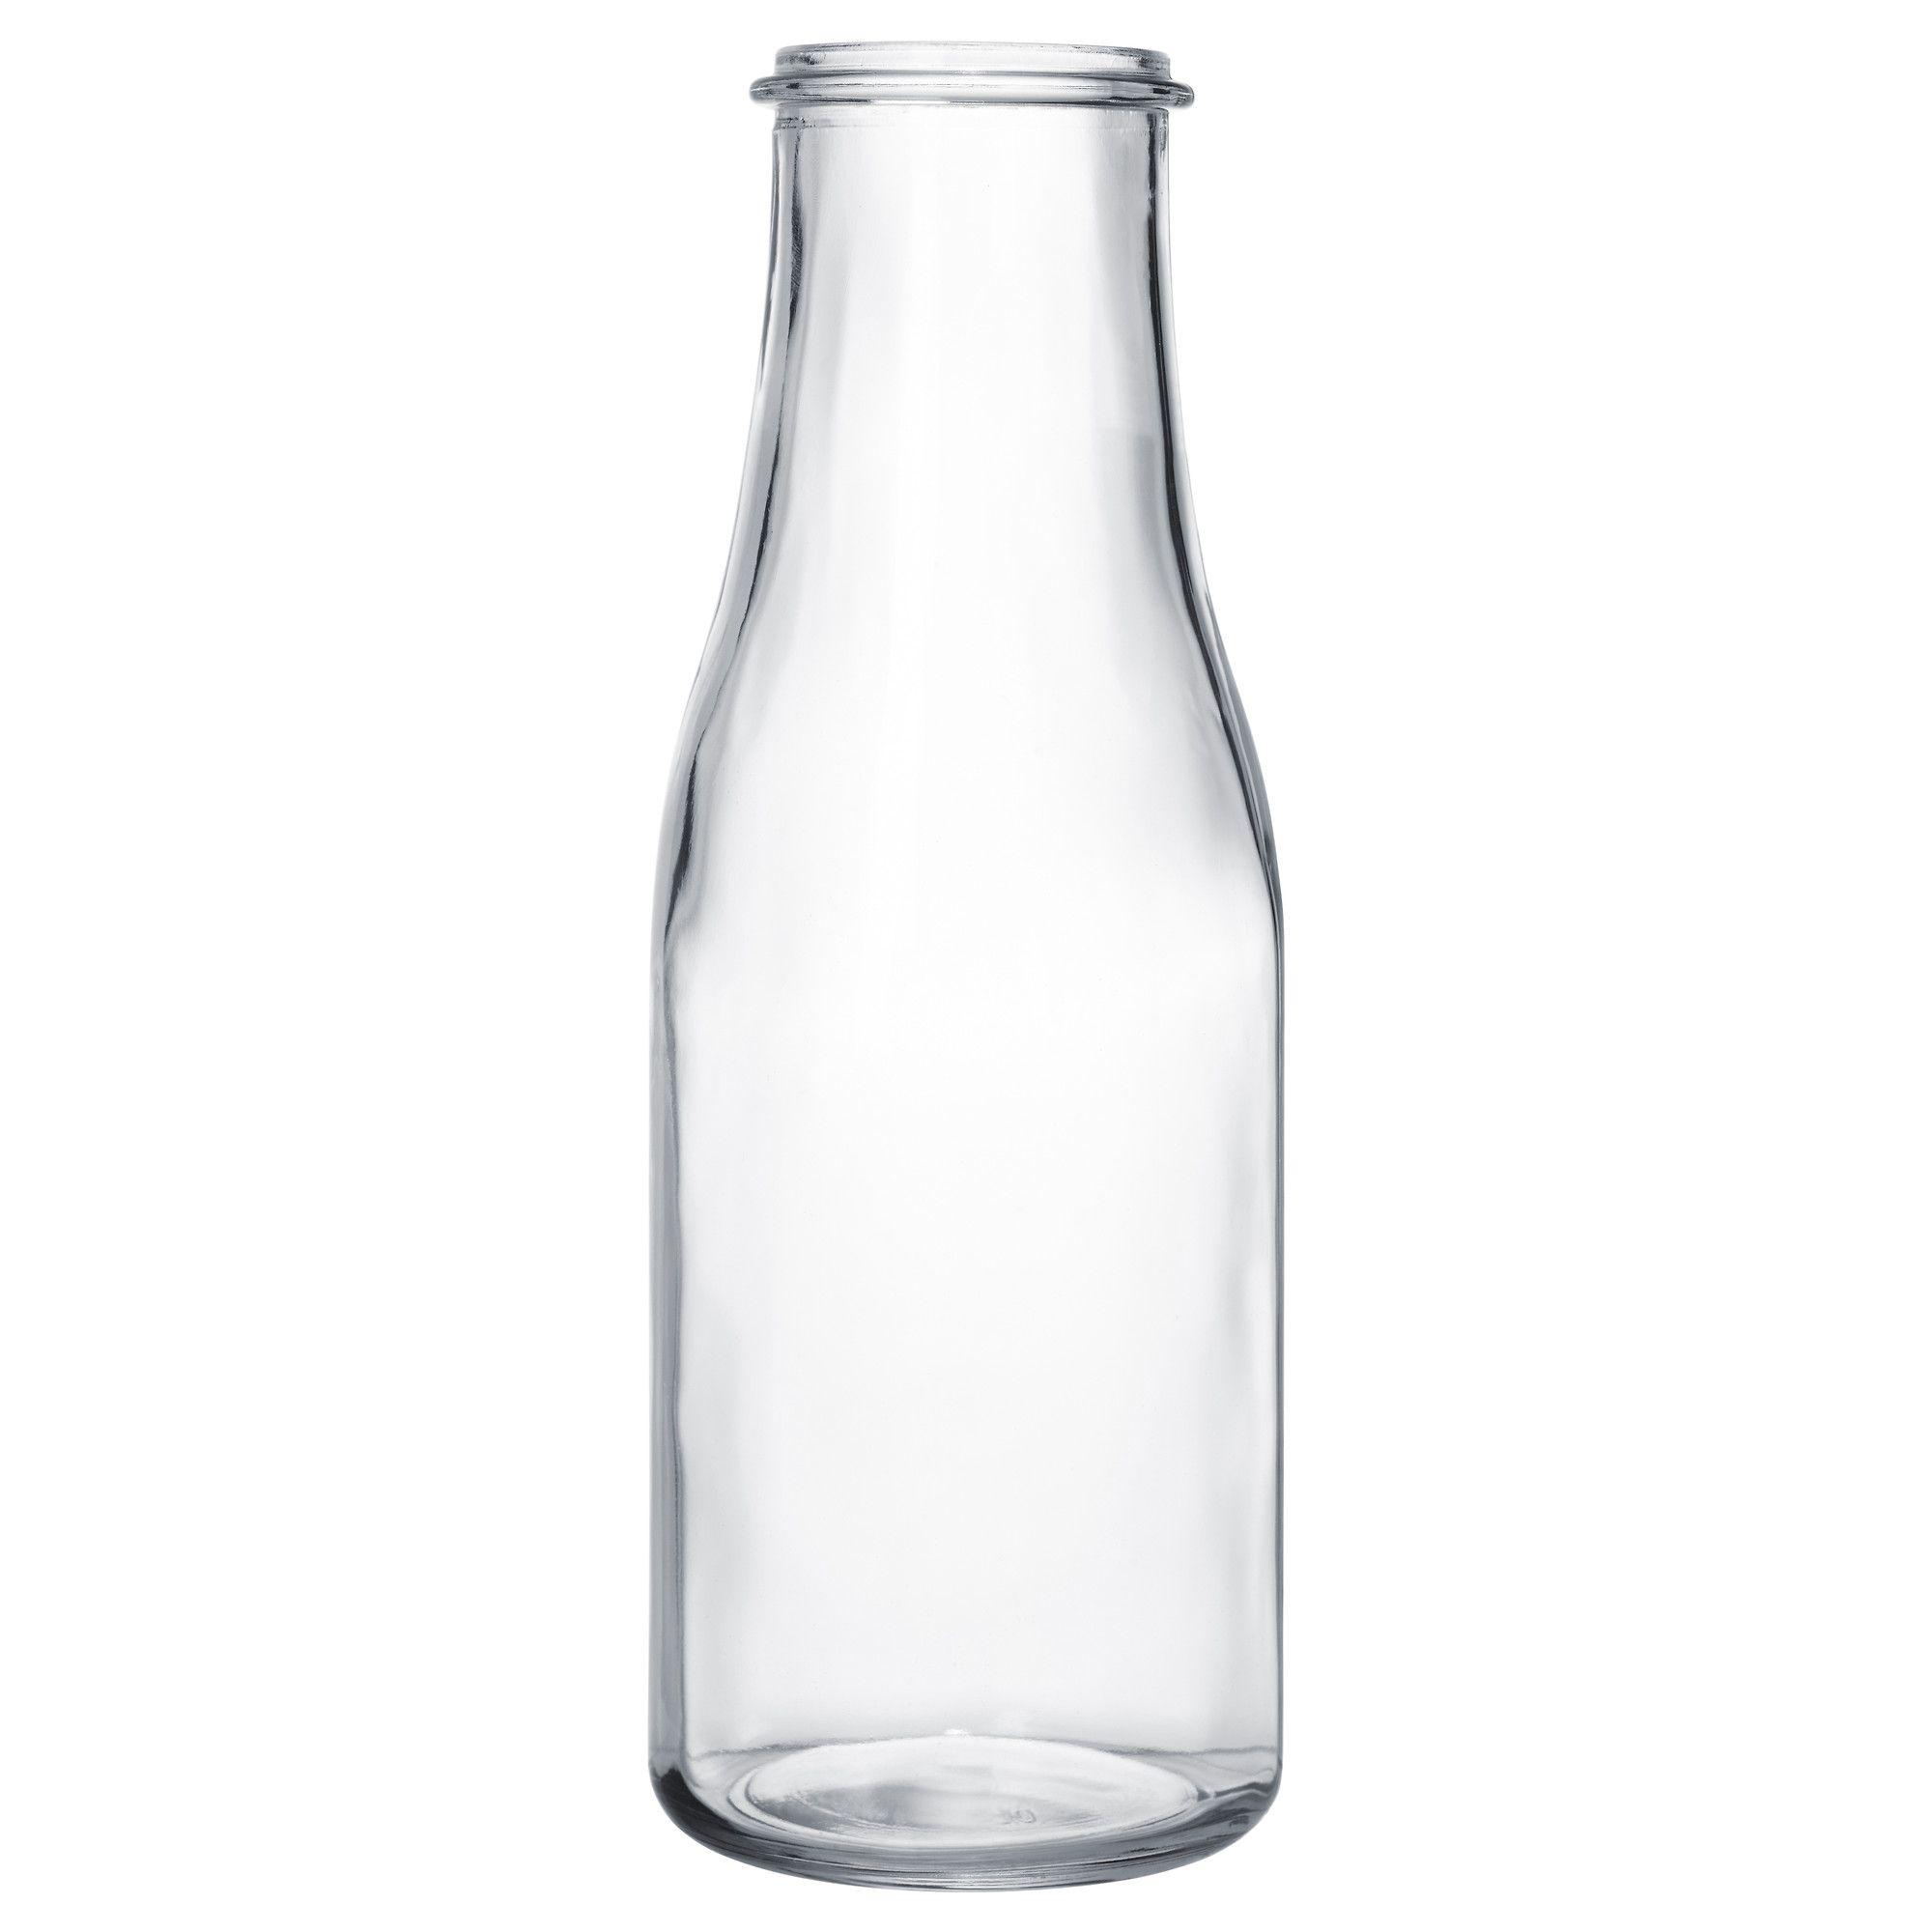 Ensidig Vase Ikea 11 39 39 Mariage Sara